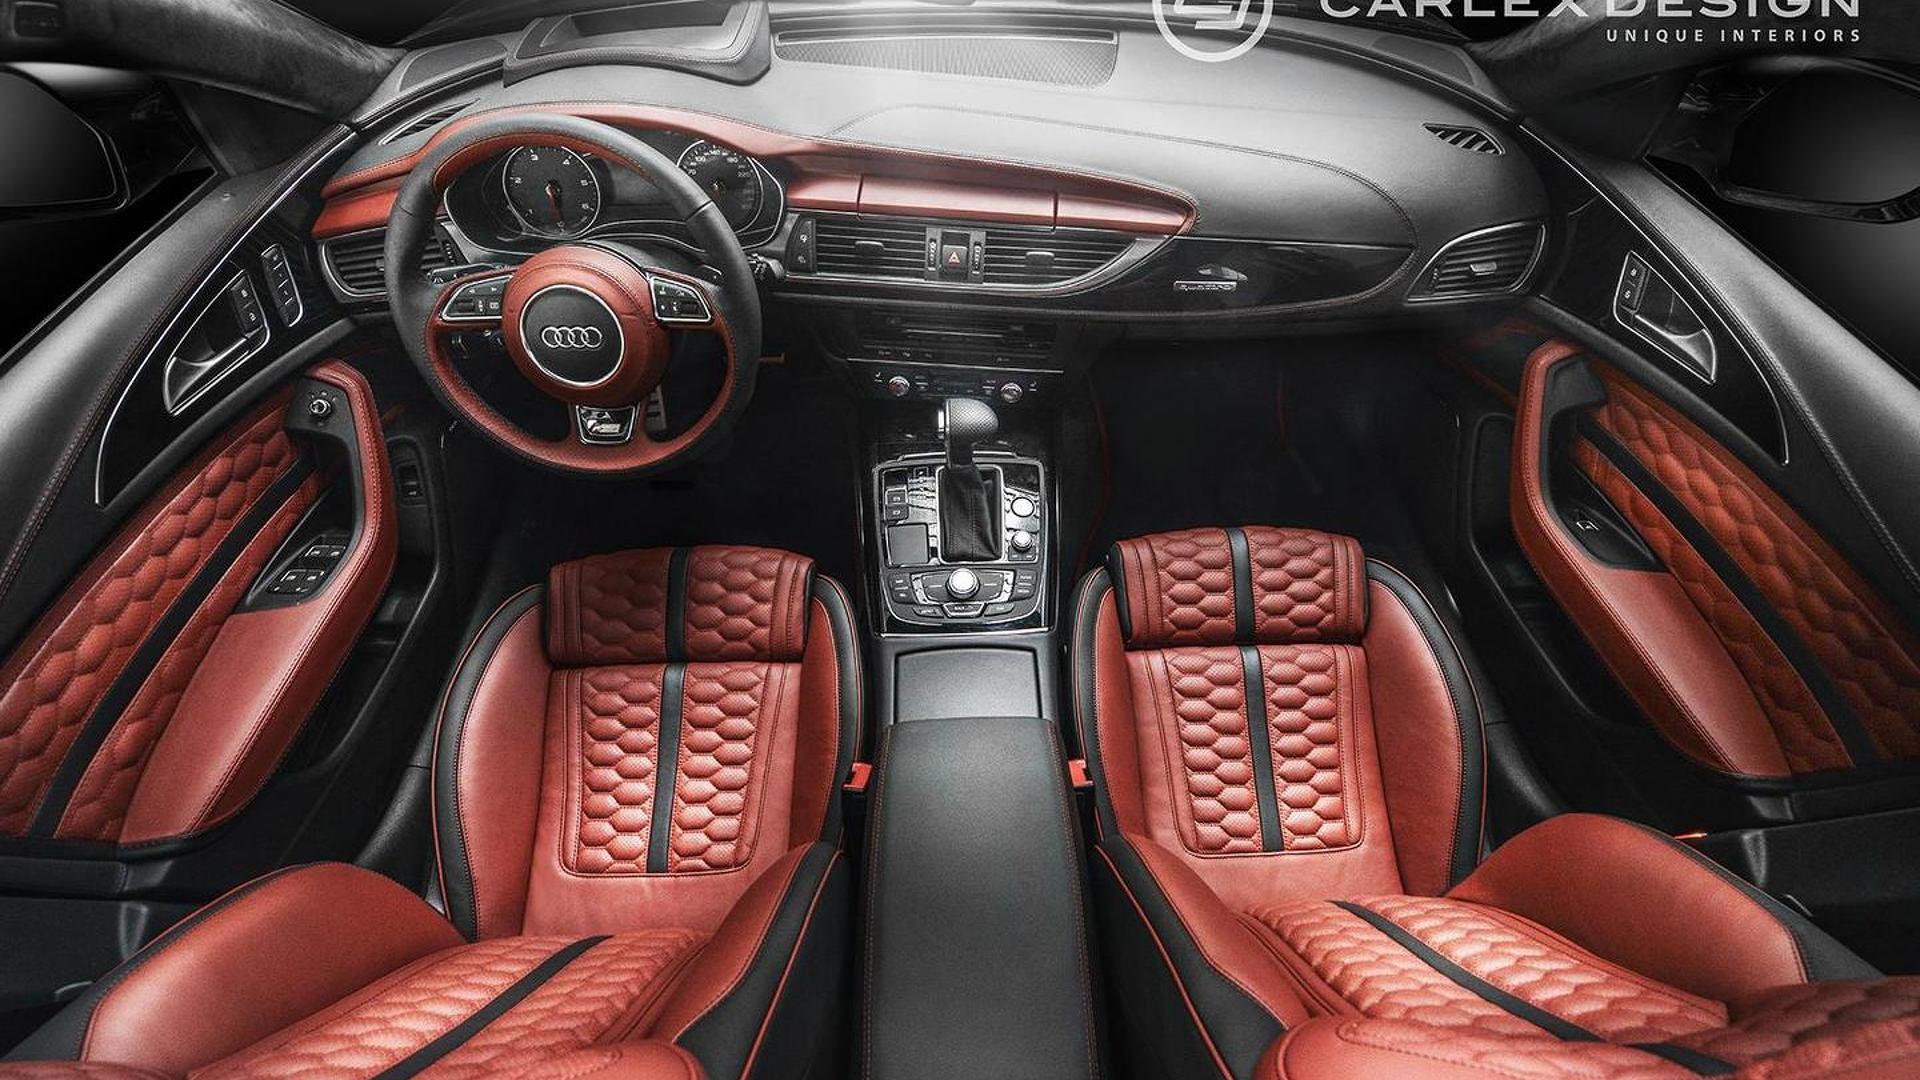 Audi A6 Avant Interior Gets Honeycomb Theme From Carlex Design